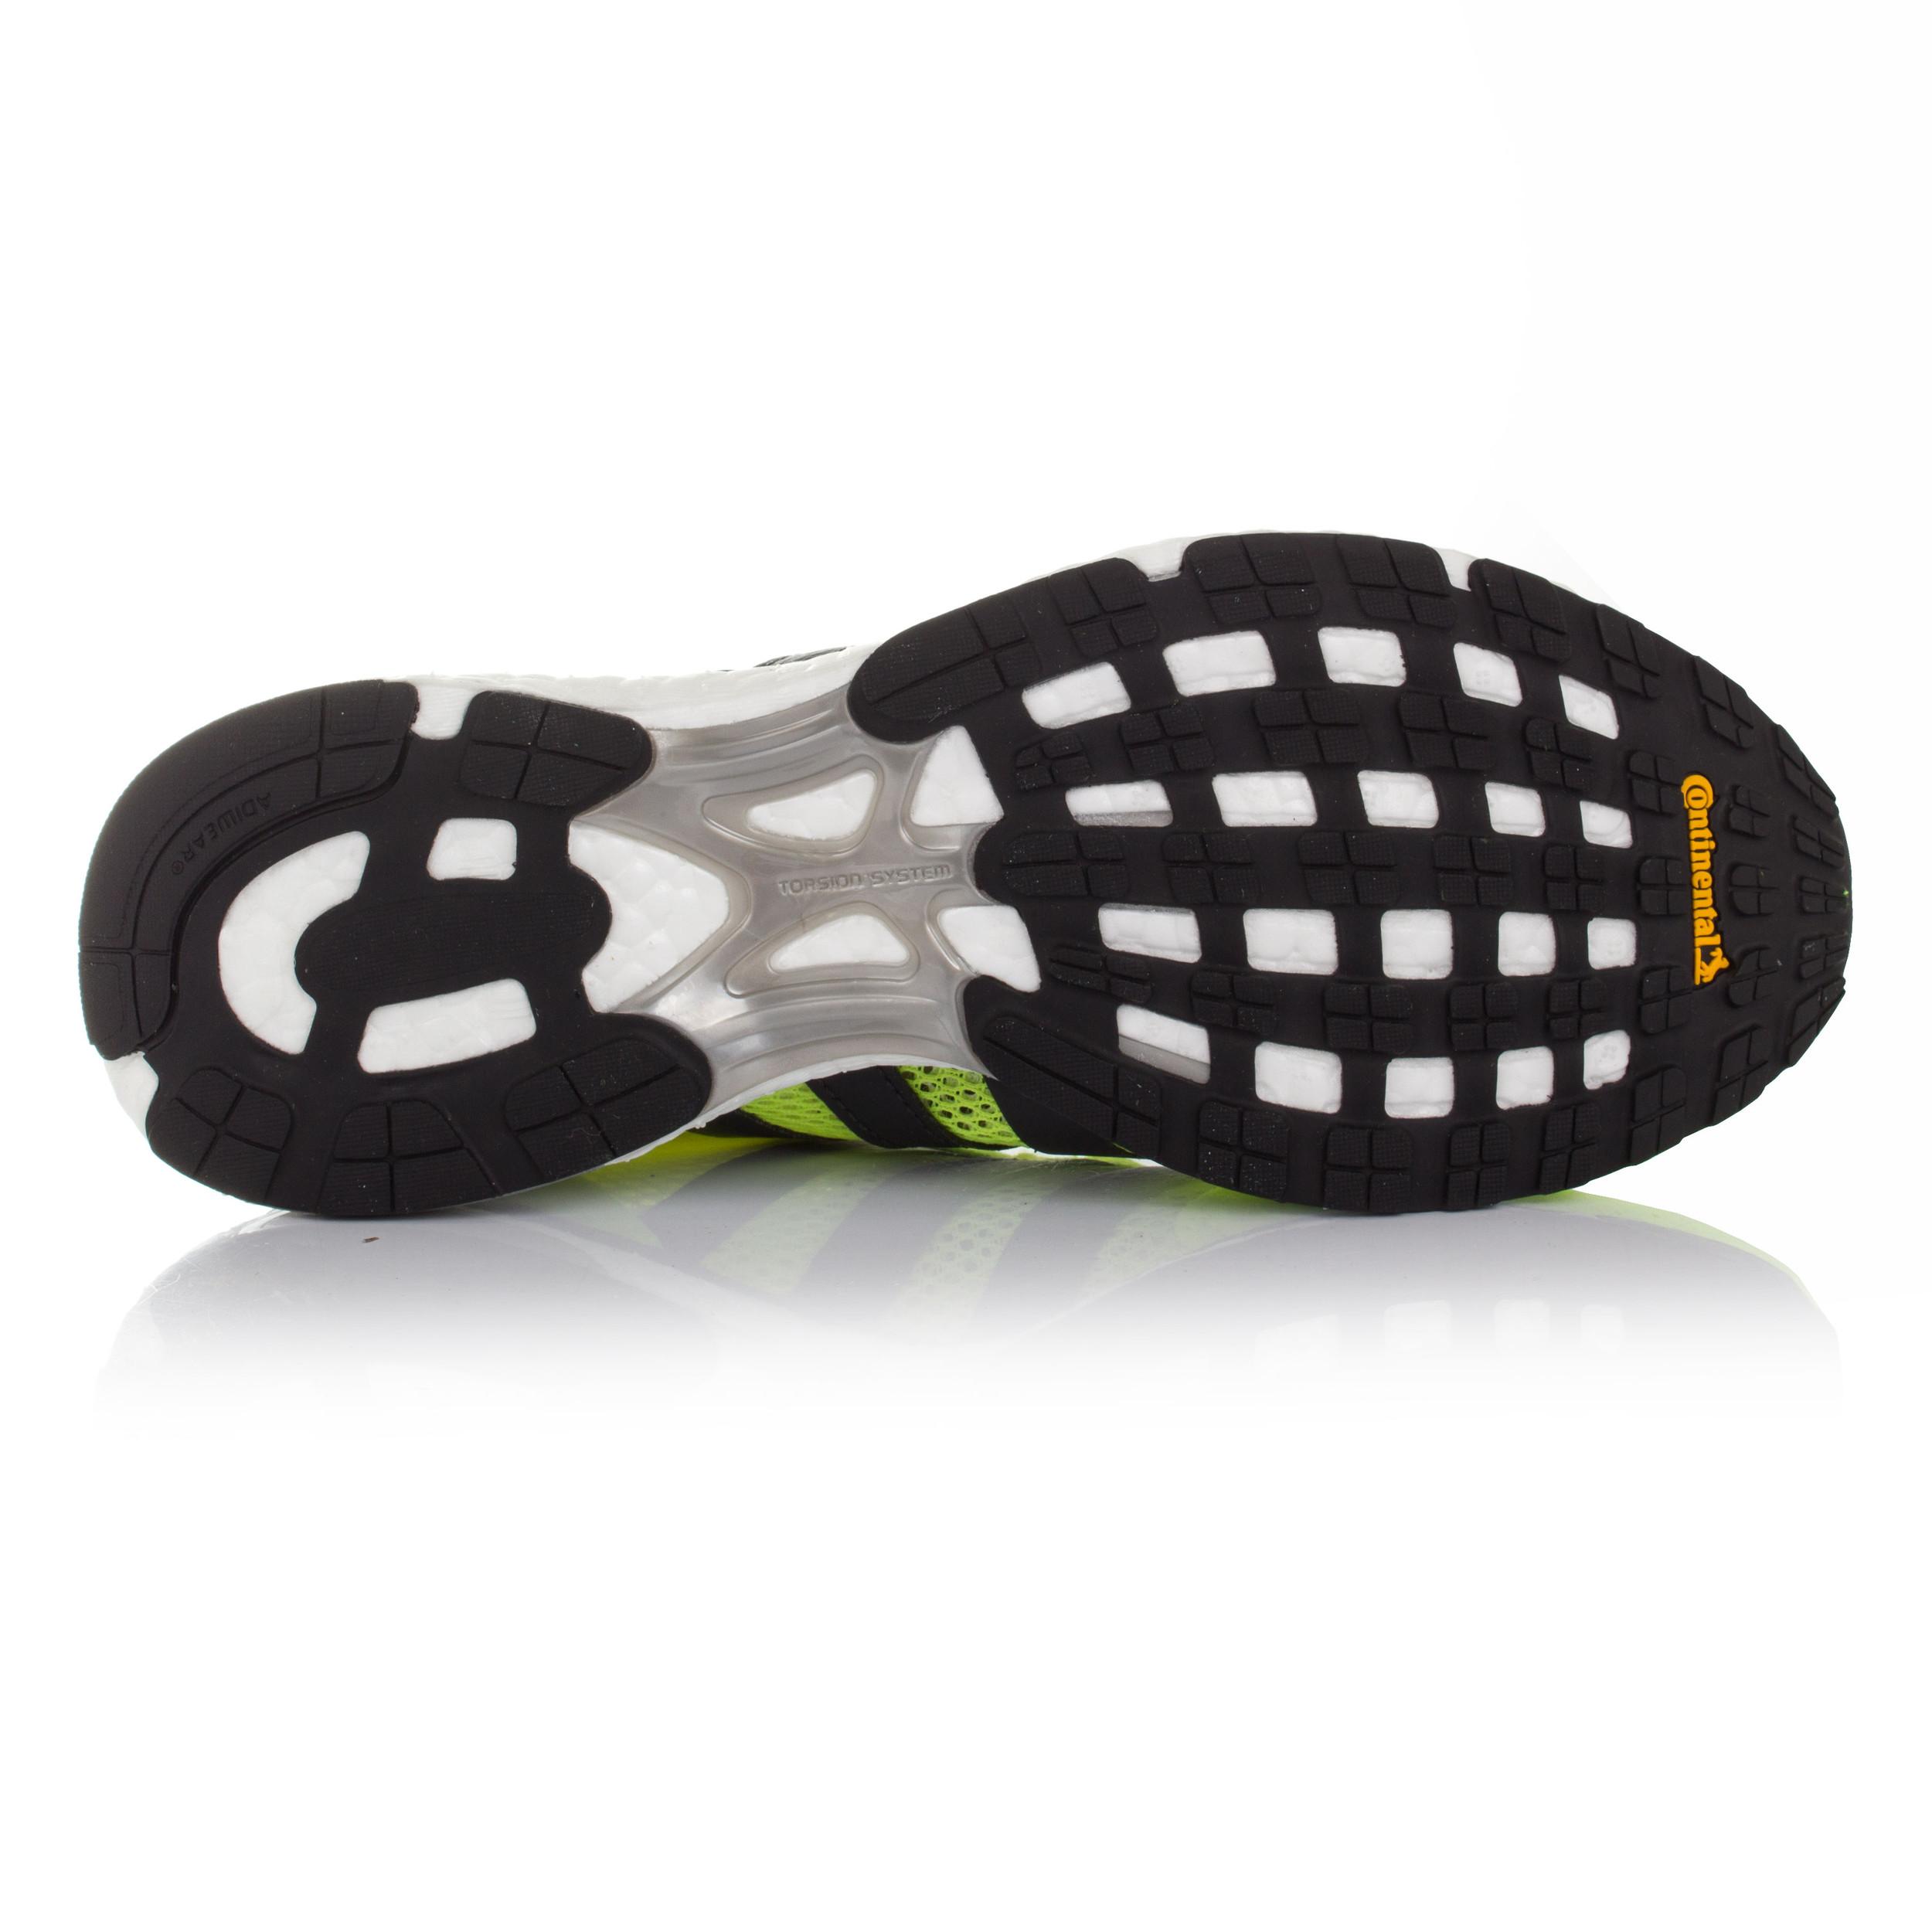 Adidas Running Adizero Shoes Sports Yellow Adios Womens Road HrUwSHq